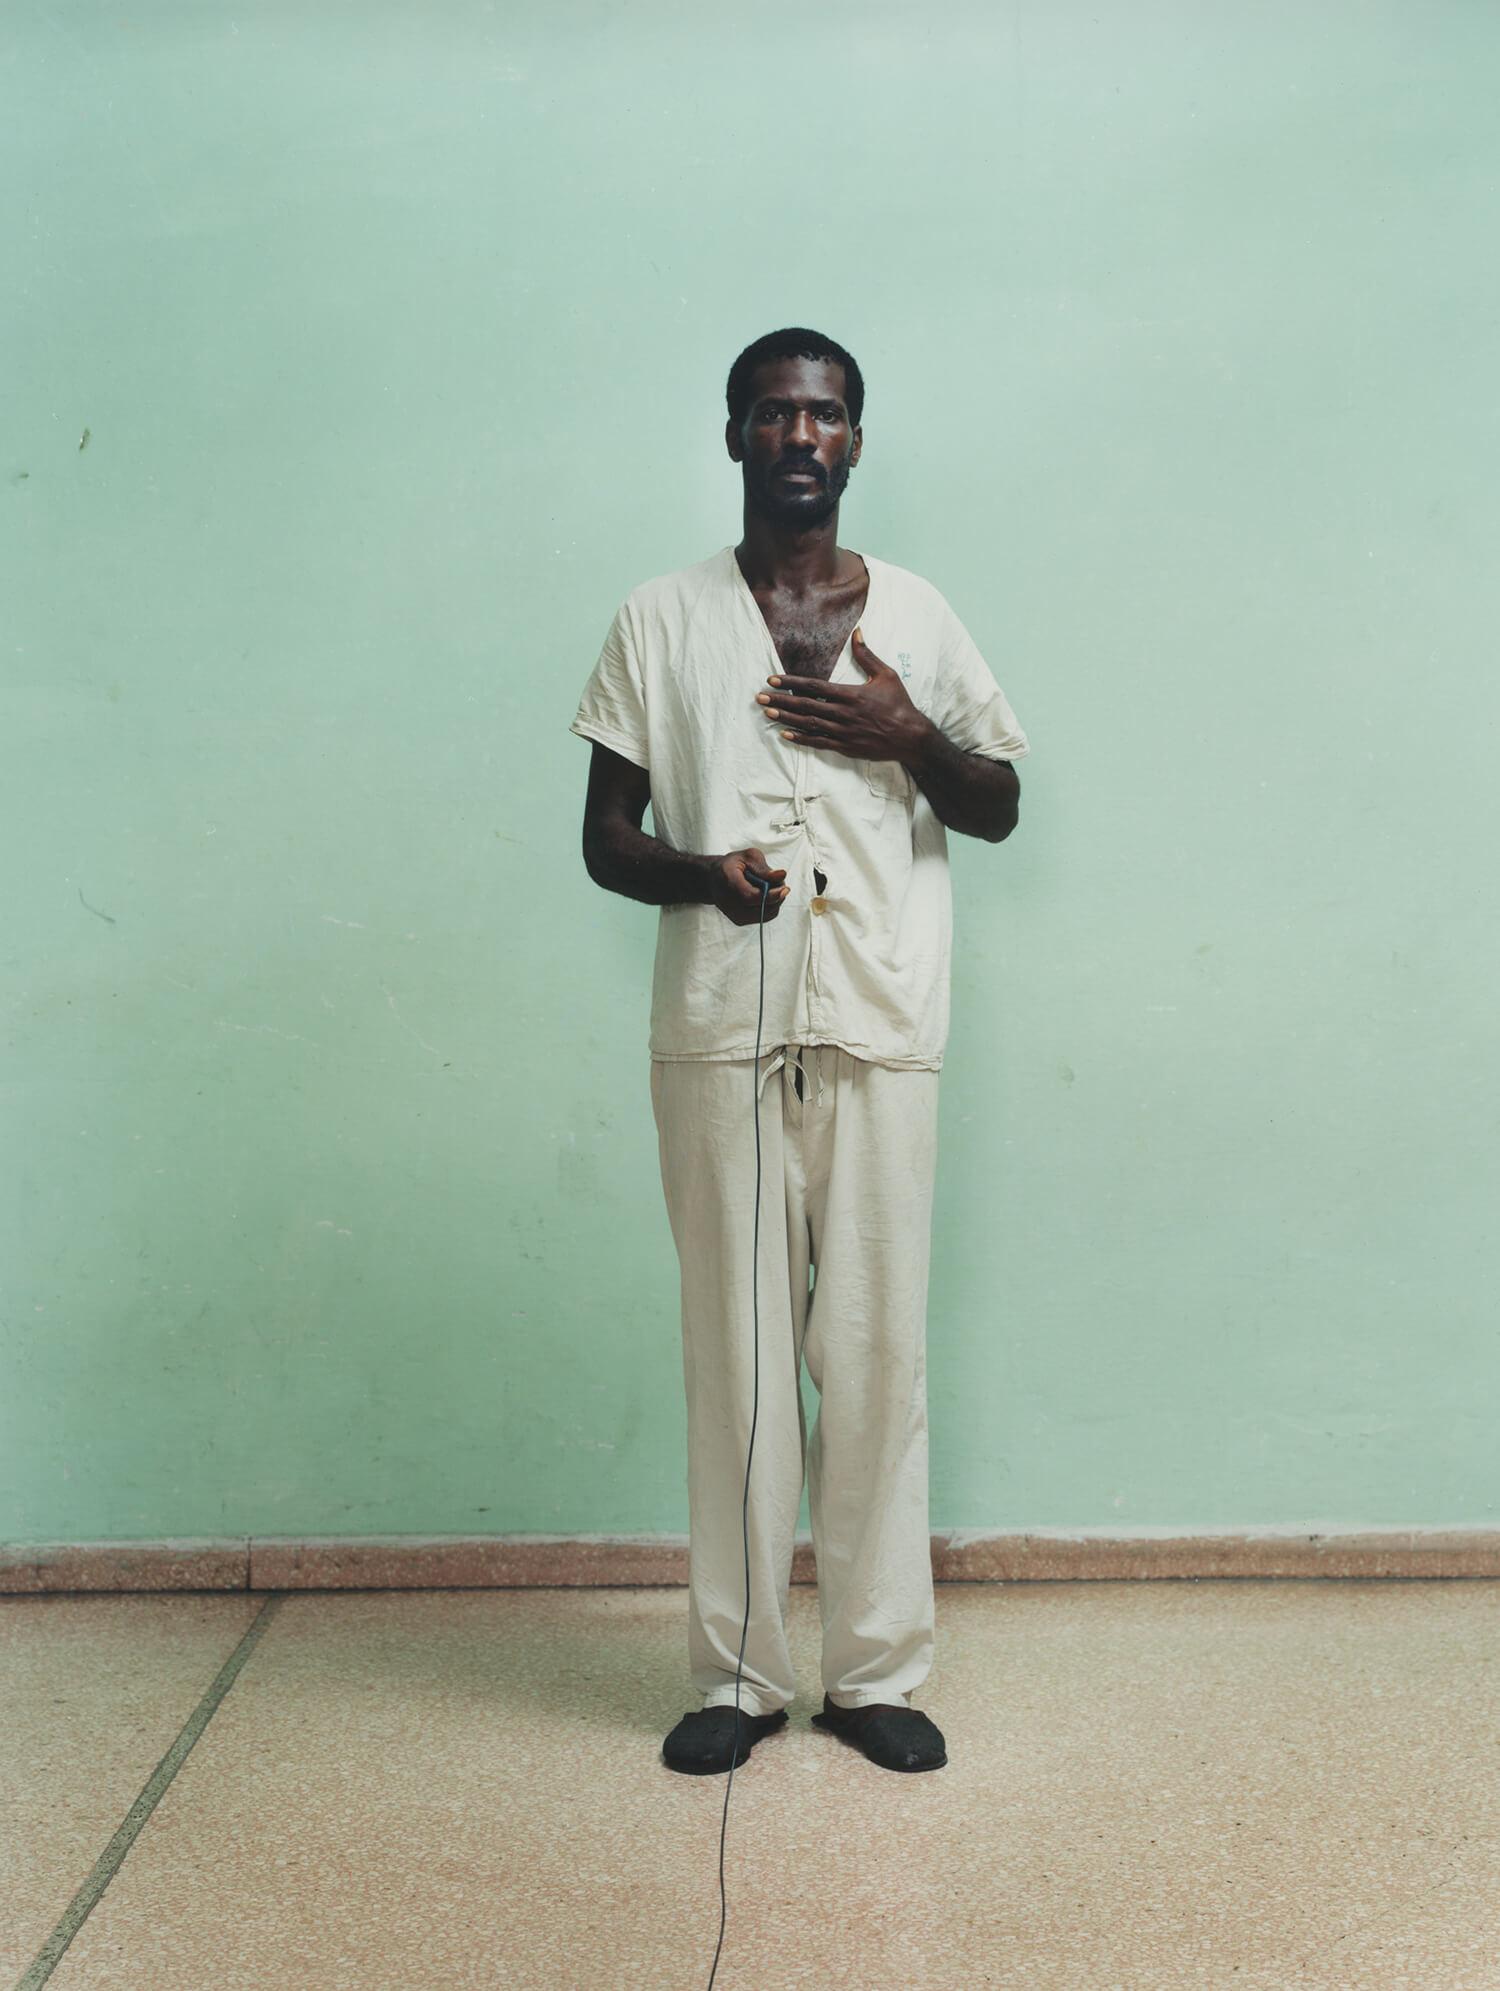 Rene Vallejo Psychiatric Hospital, Cuba, C-type print, 16 x 20 inches, 2003.